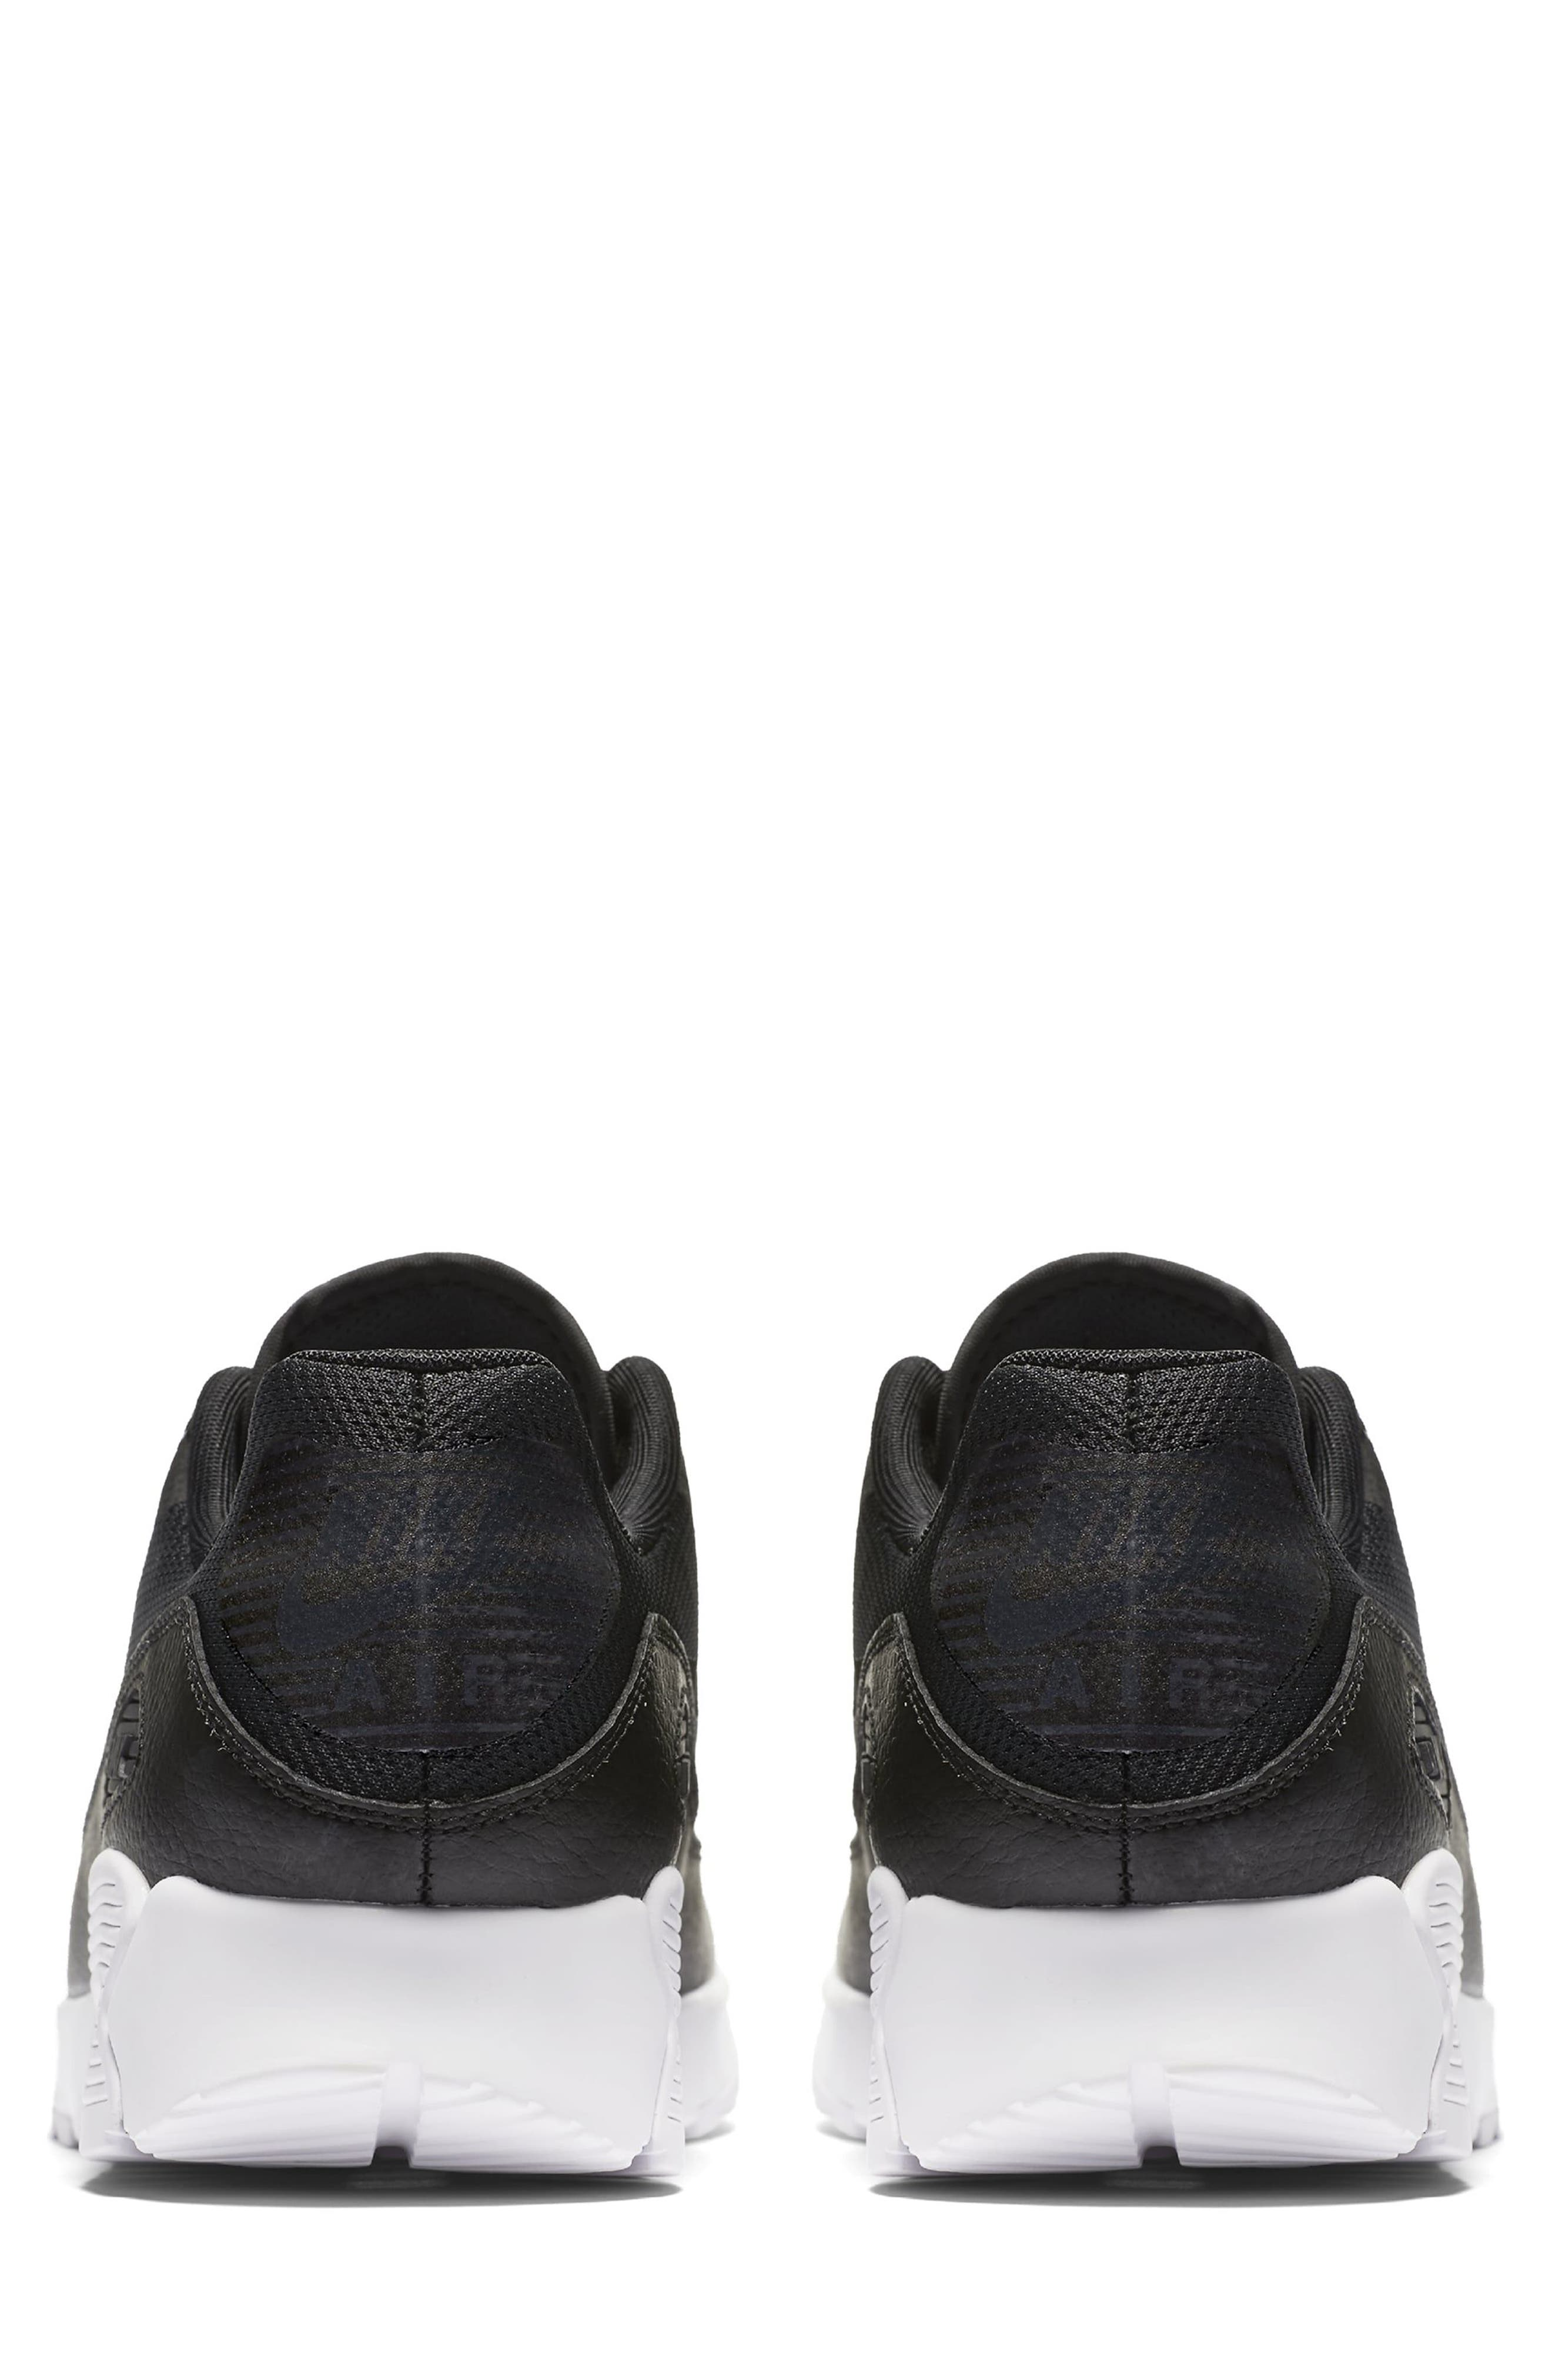 Air Max 90 Ultra 2.0 Sneaker,                             Alternate thumbnail 2, color,                             002